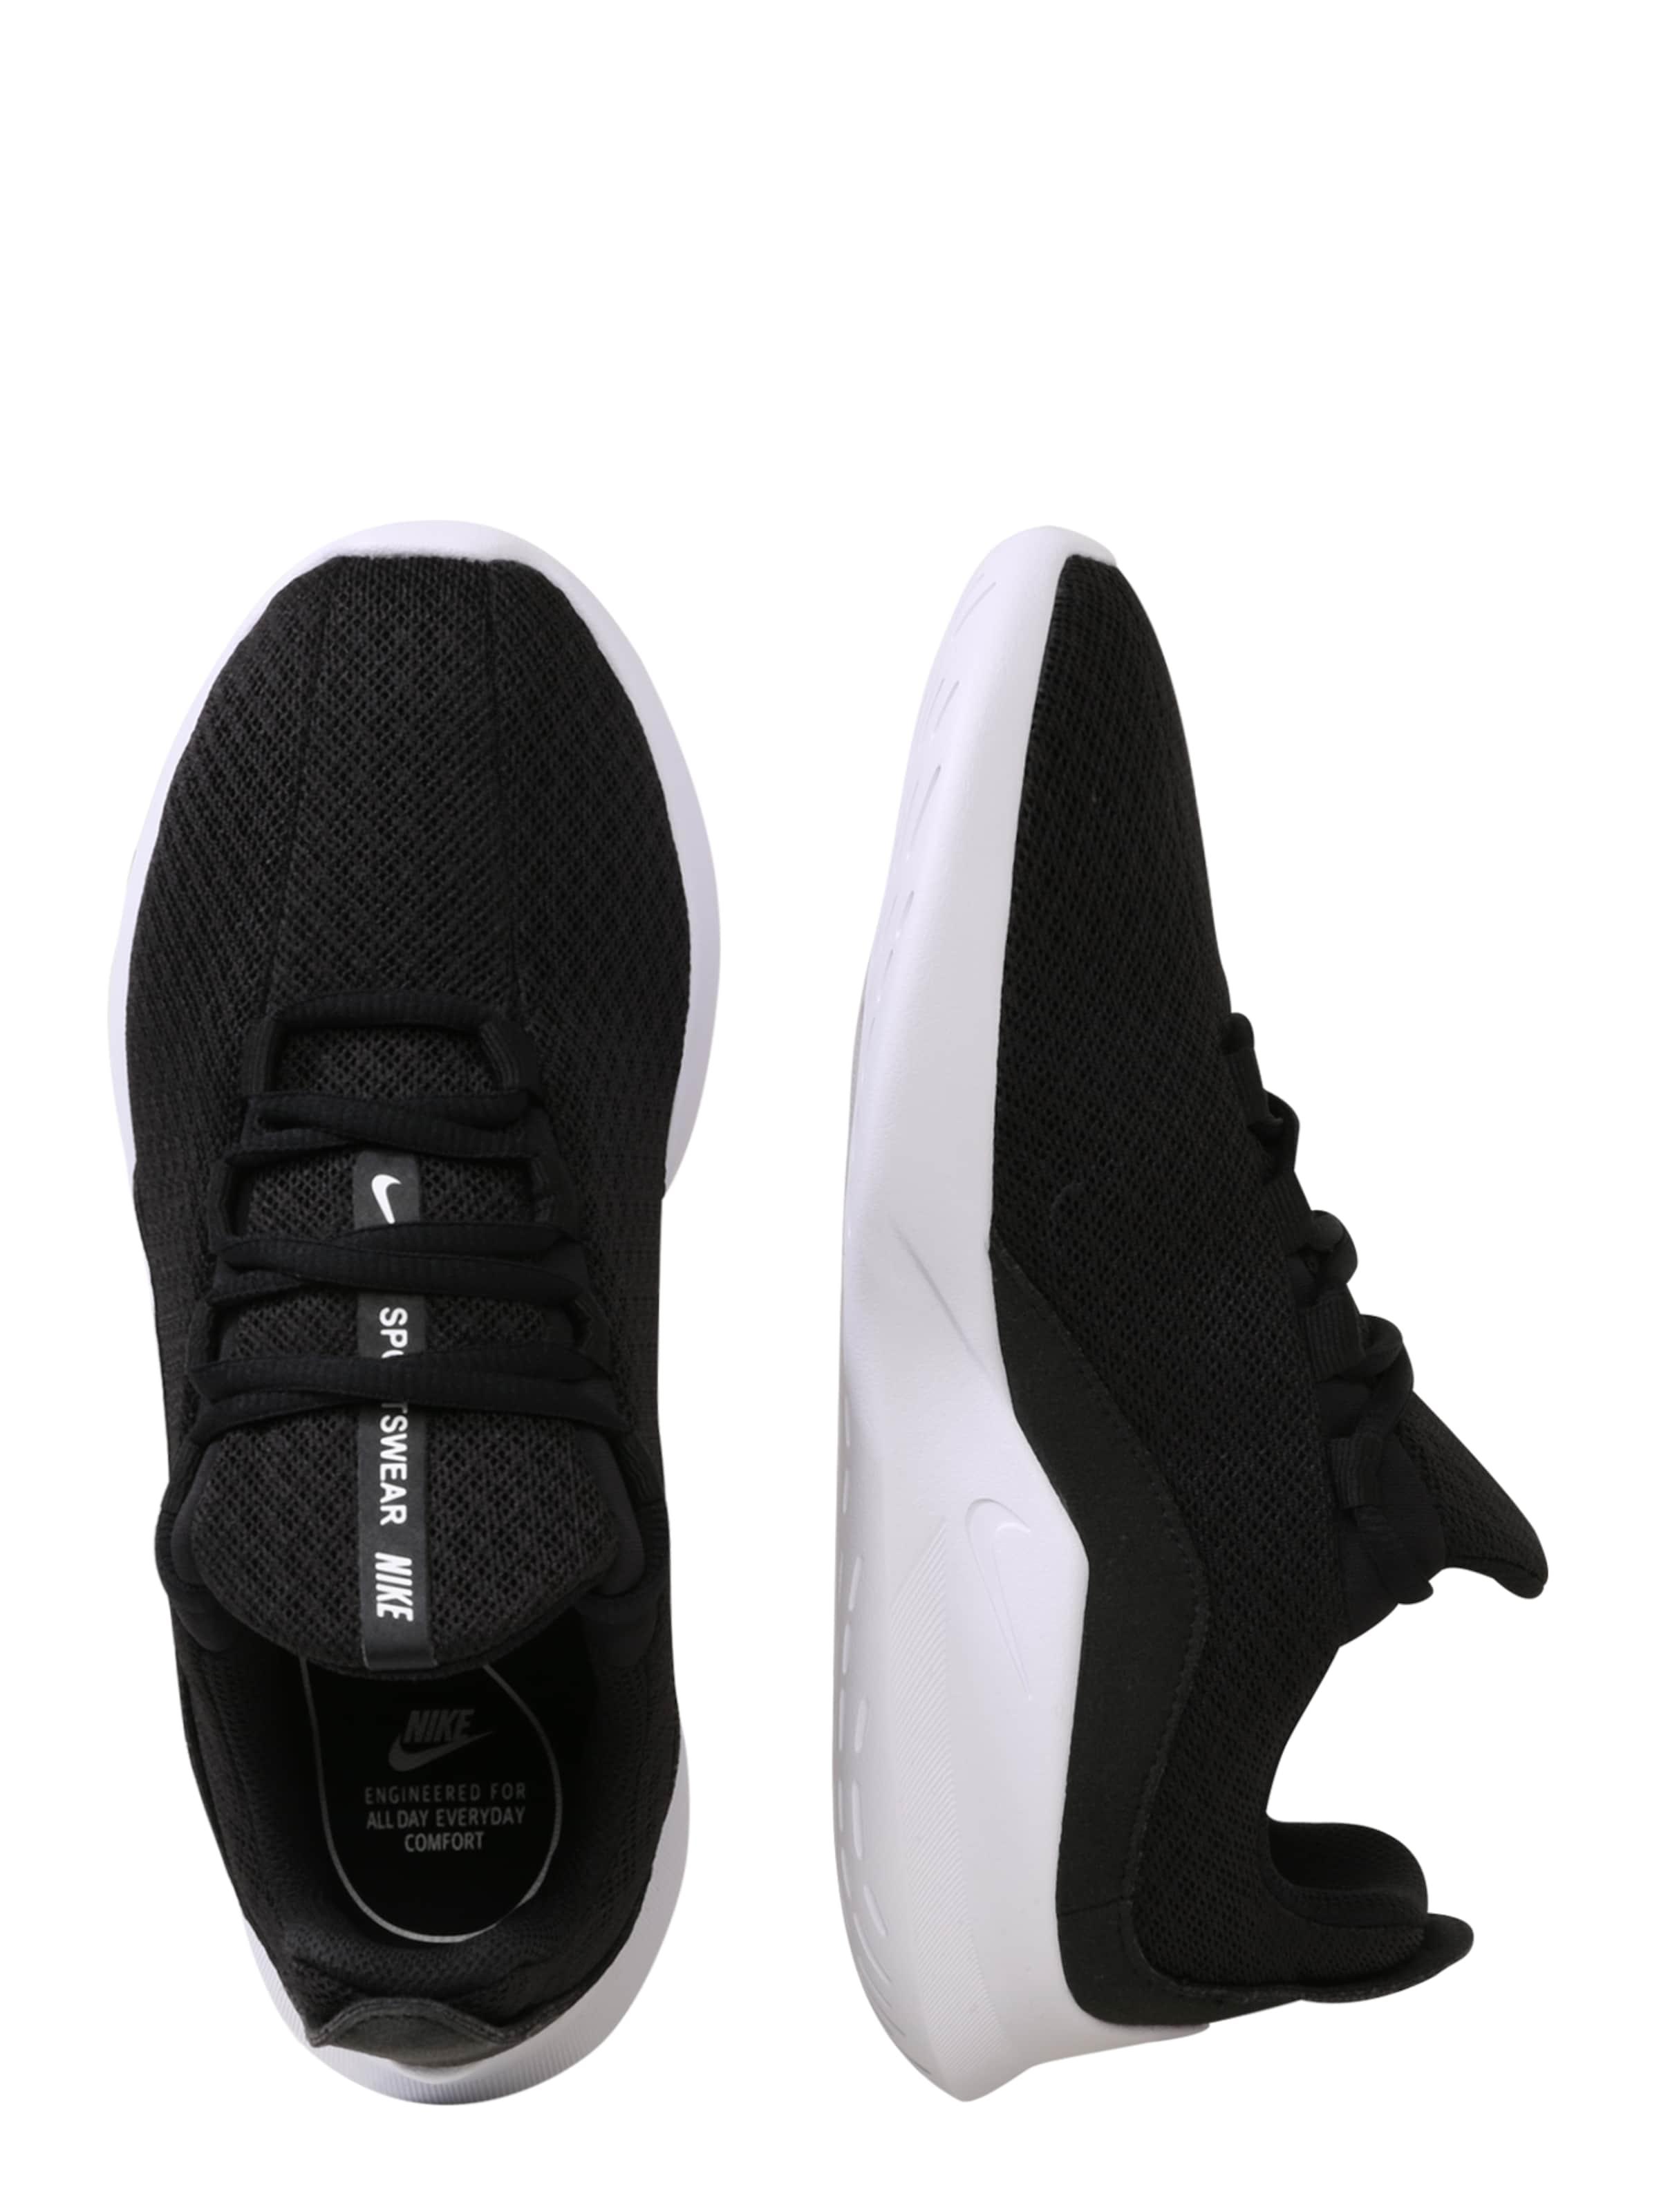 Nike Sportswear Turnschuhe 'Nike Viale Textil Billige Billige Billige Herren- und Damenschuhe e71f26